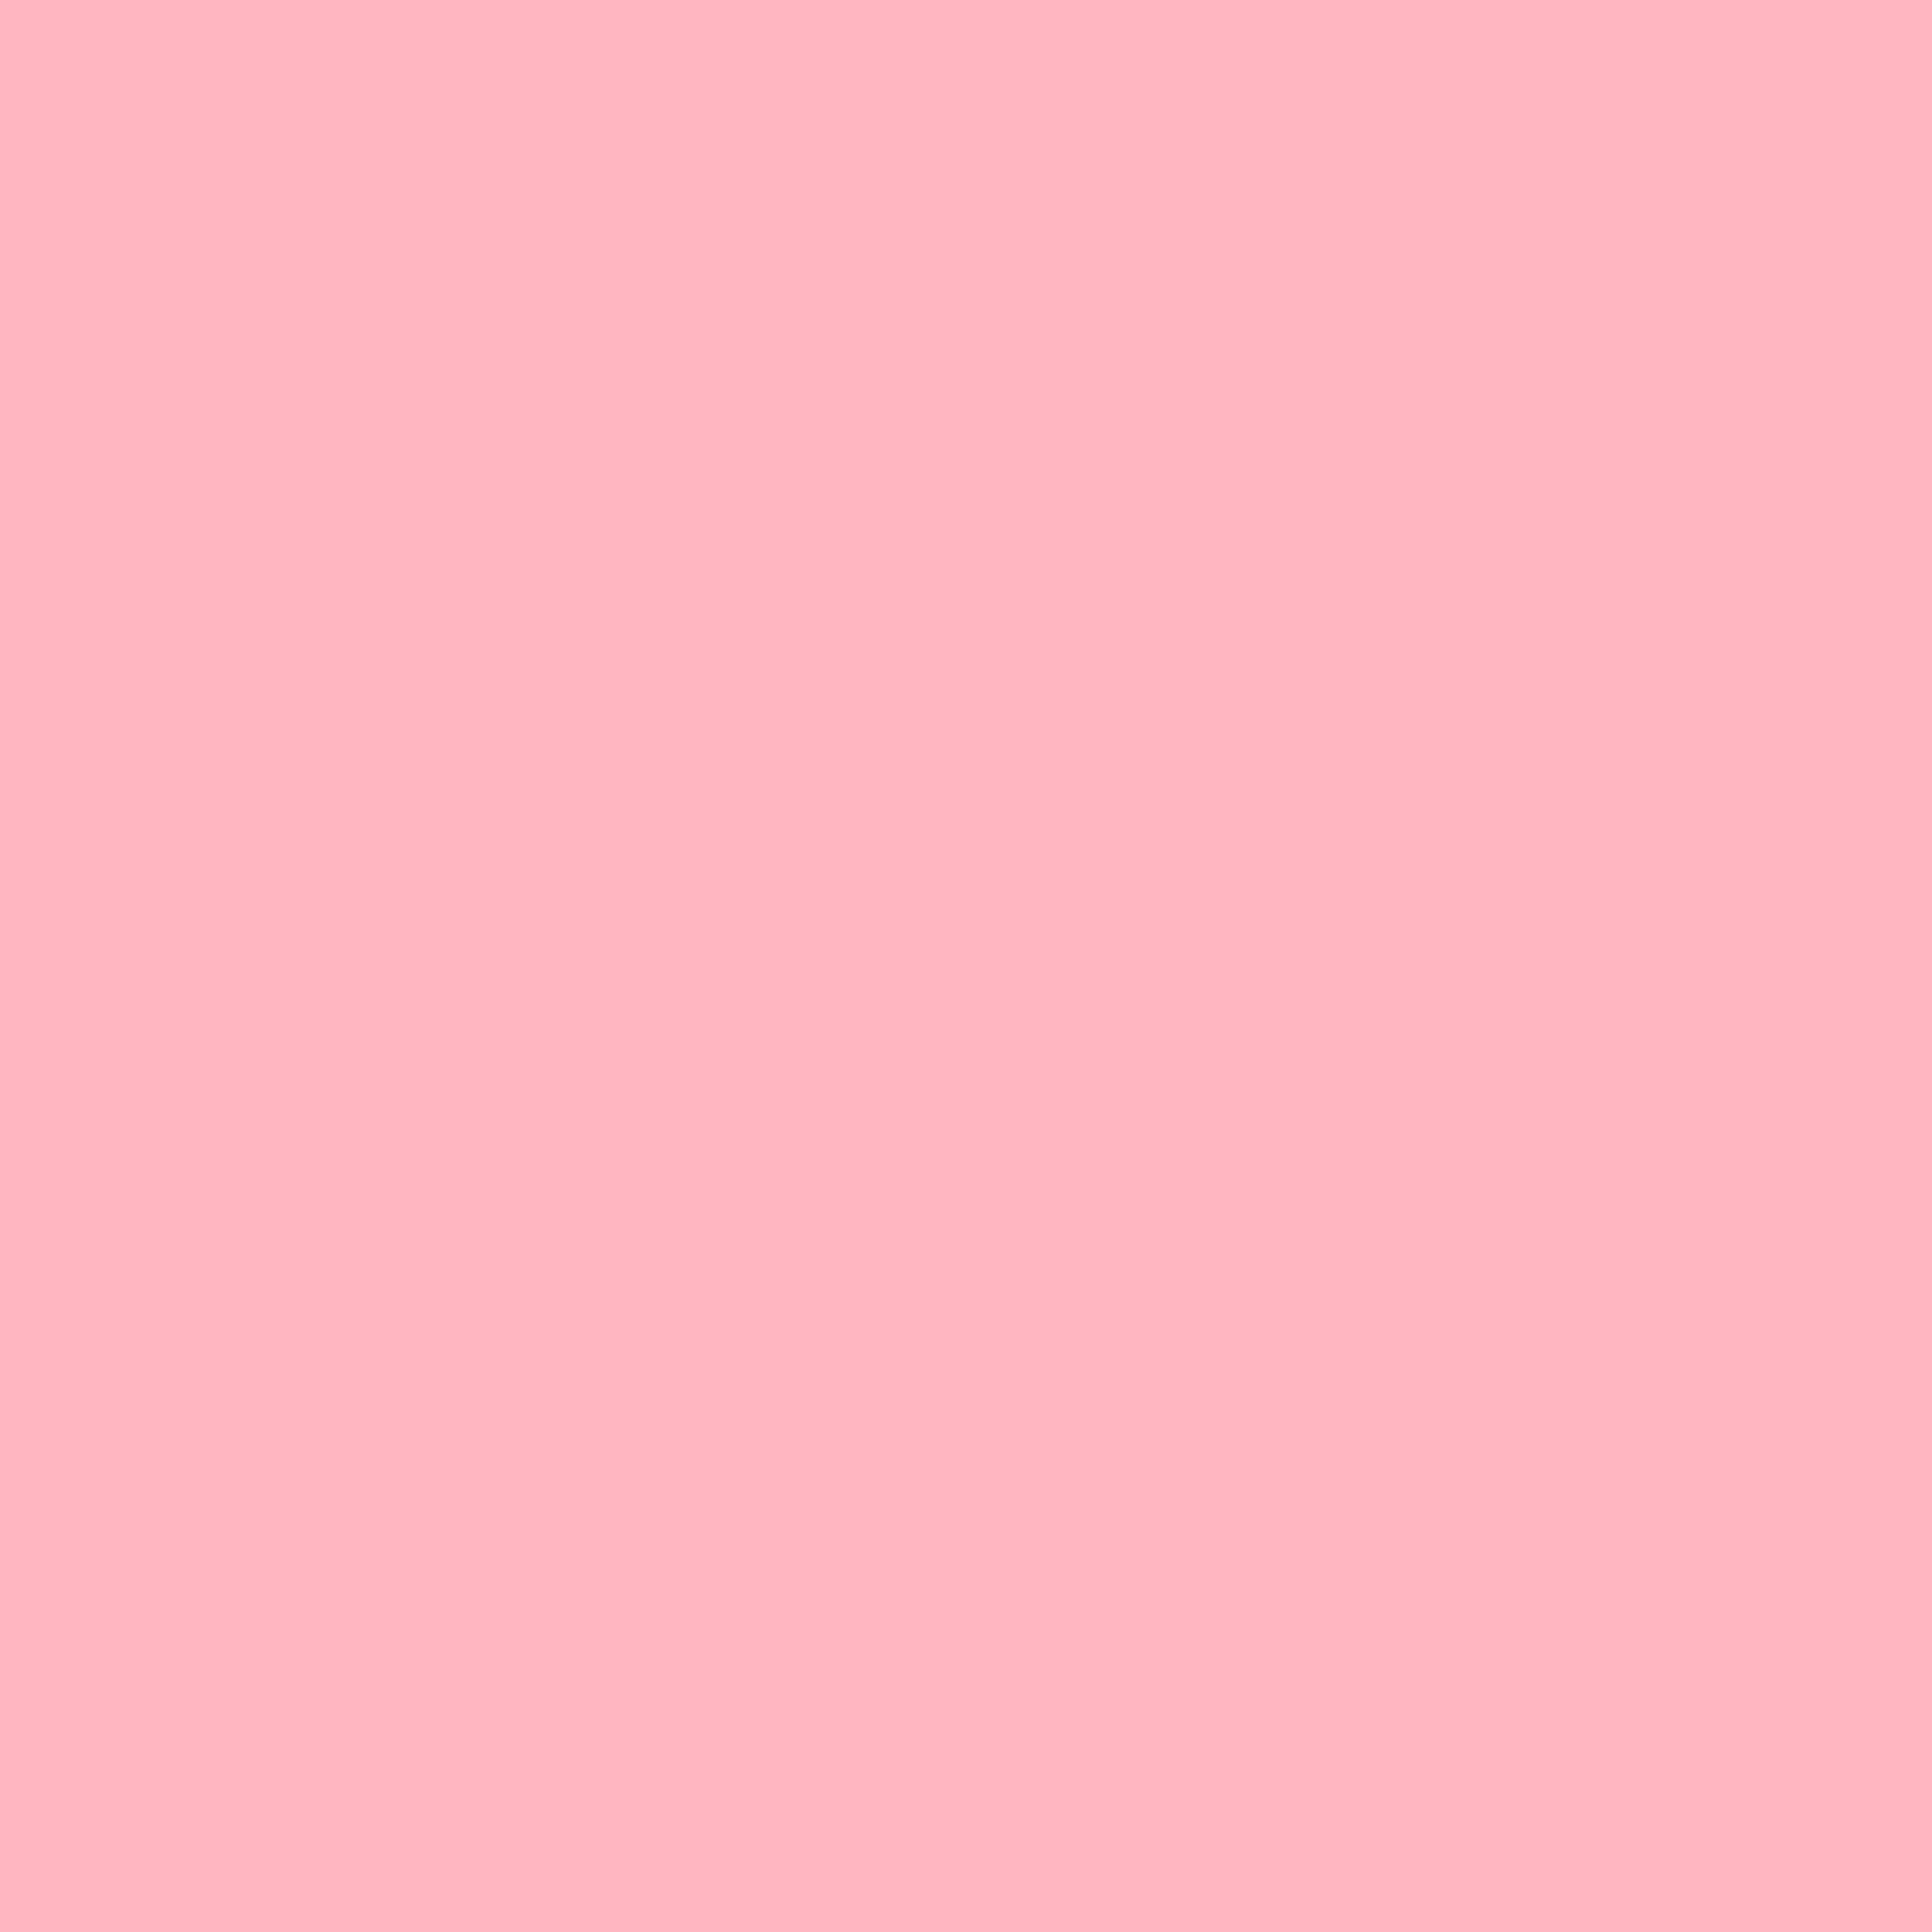 3600x3600 Light Pink Solid Color Background